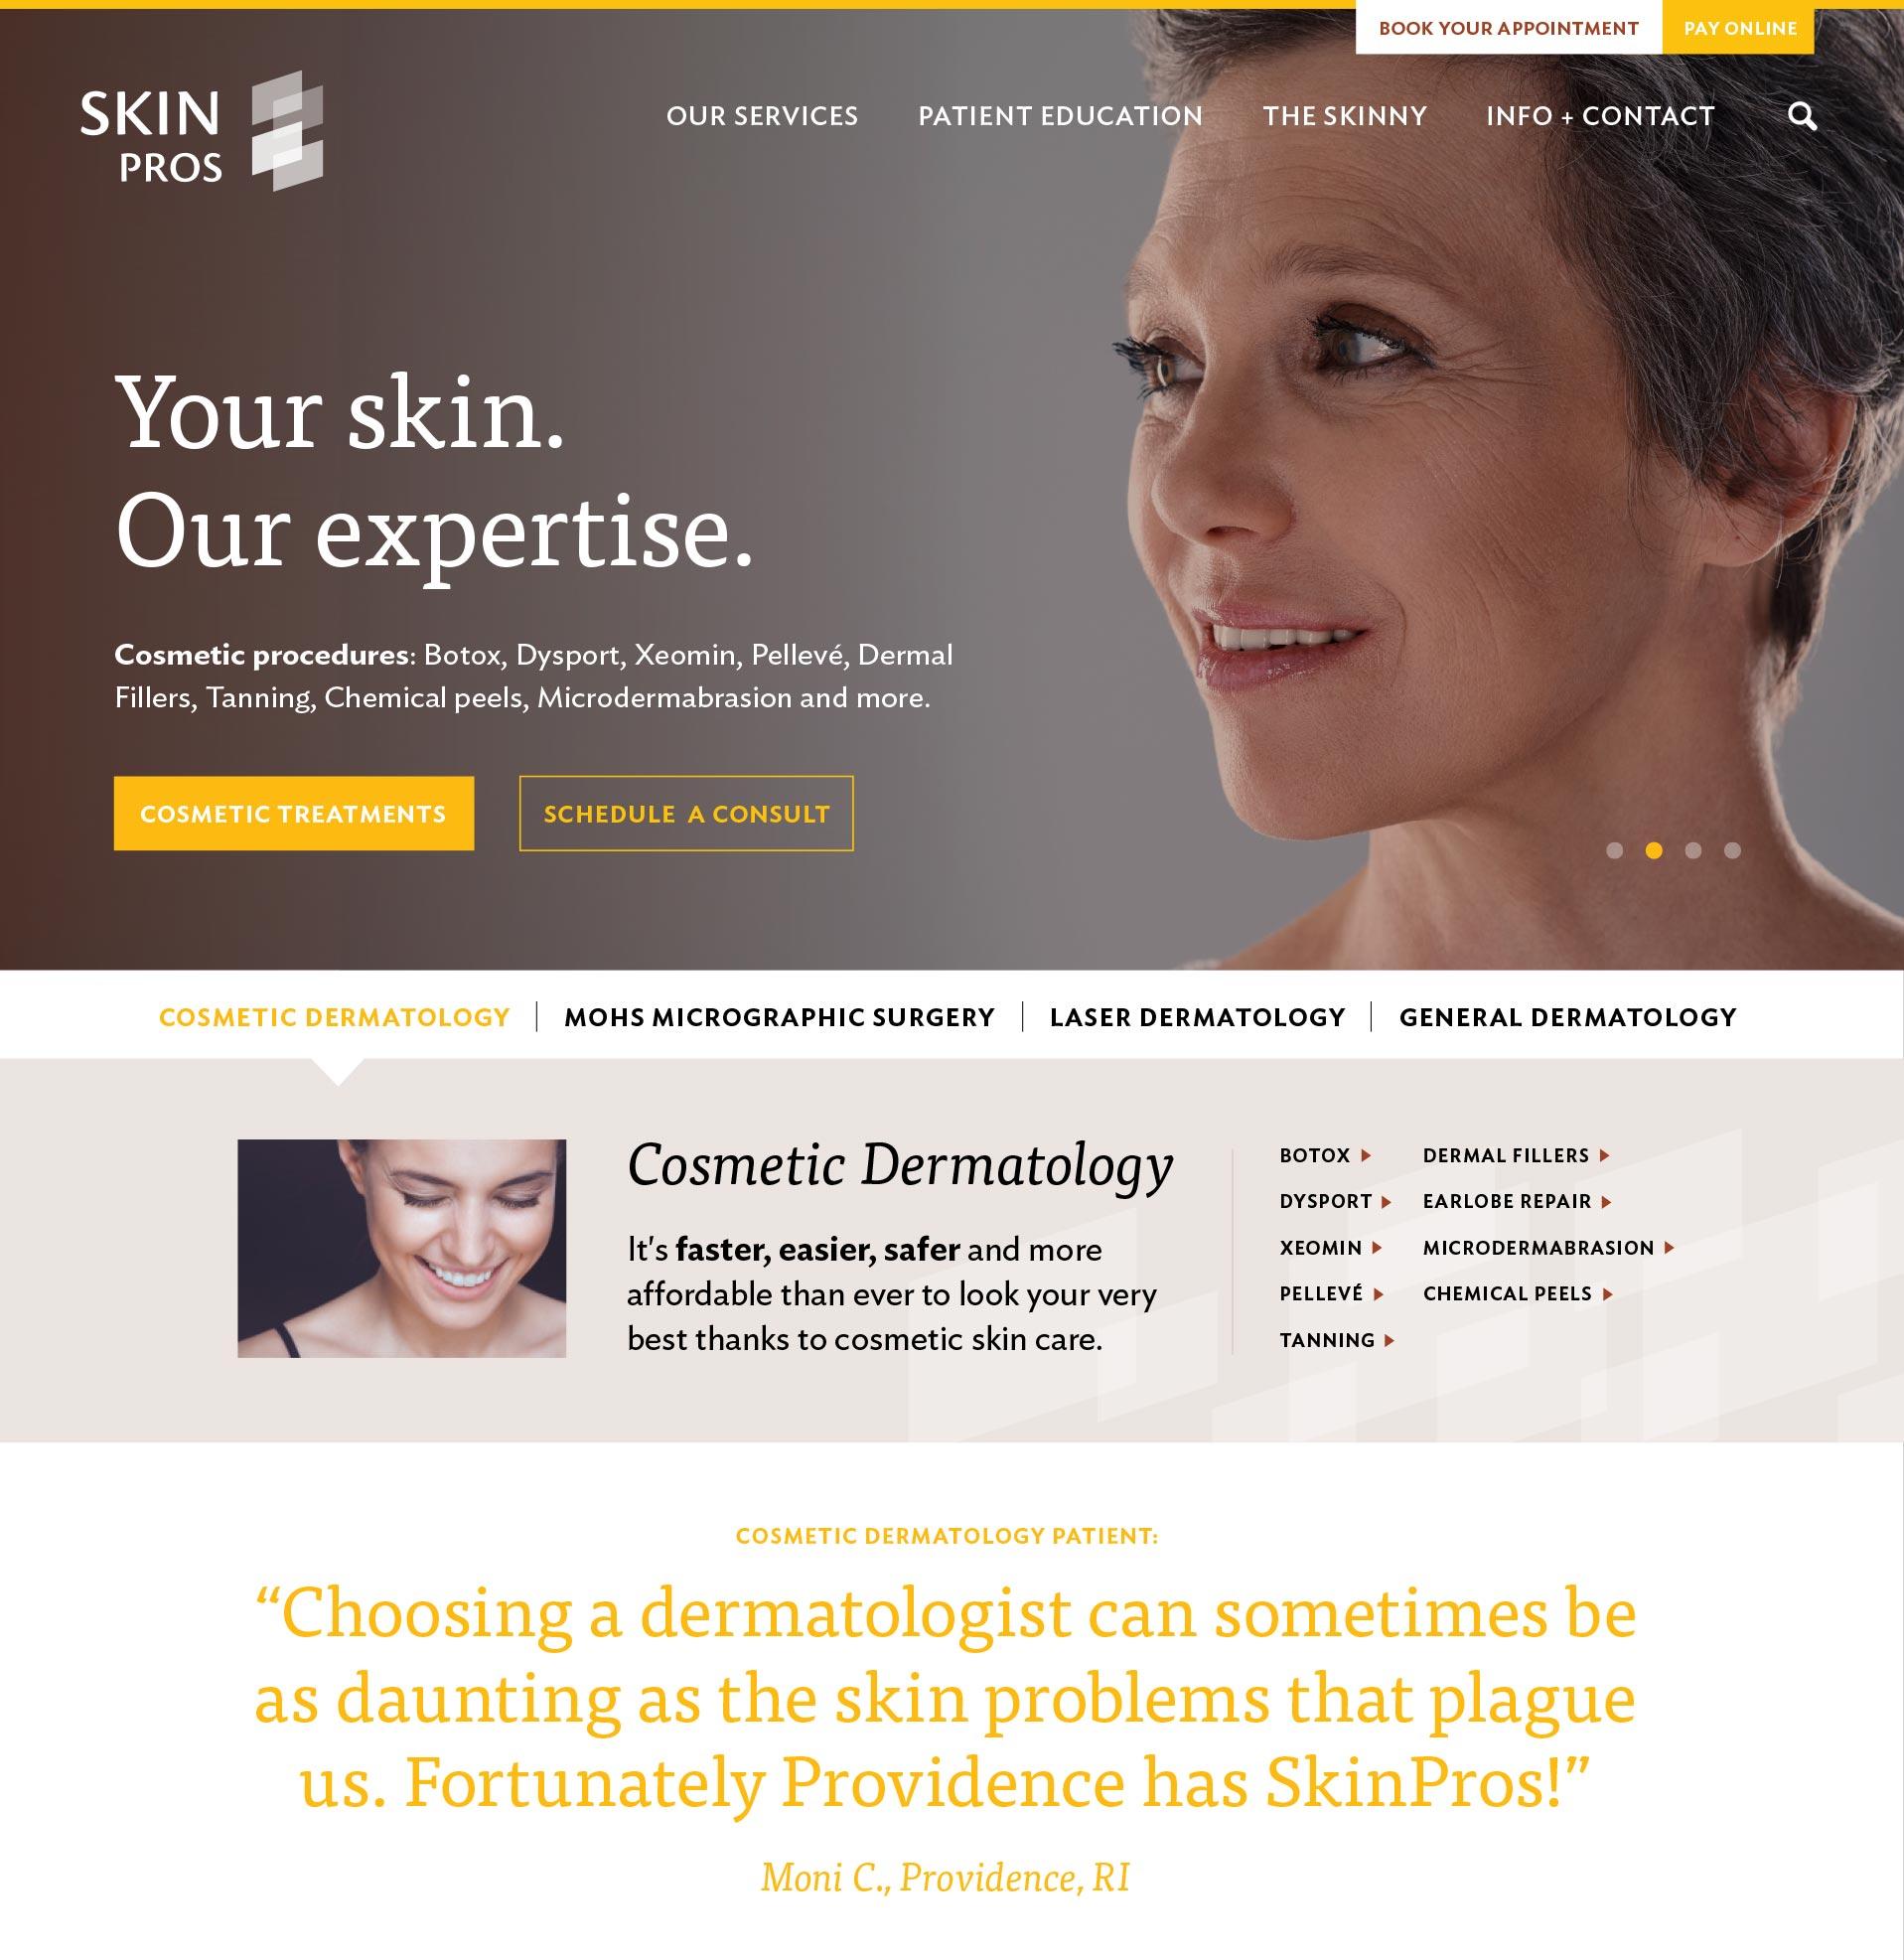 website design for medical care company